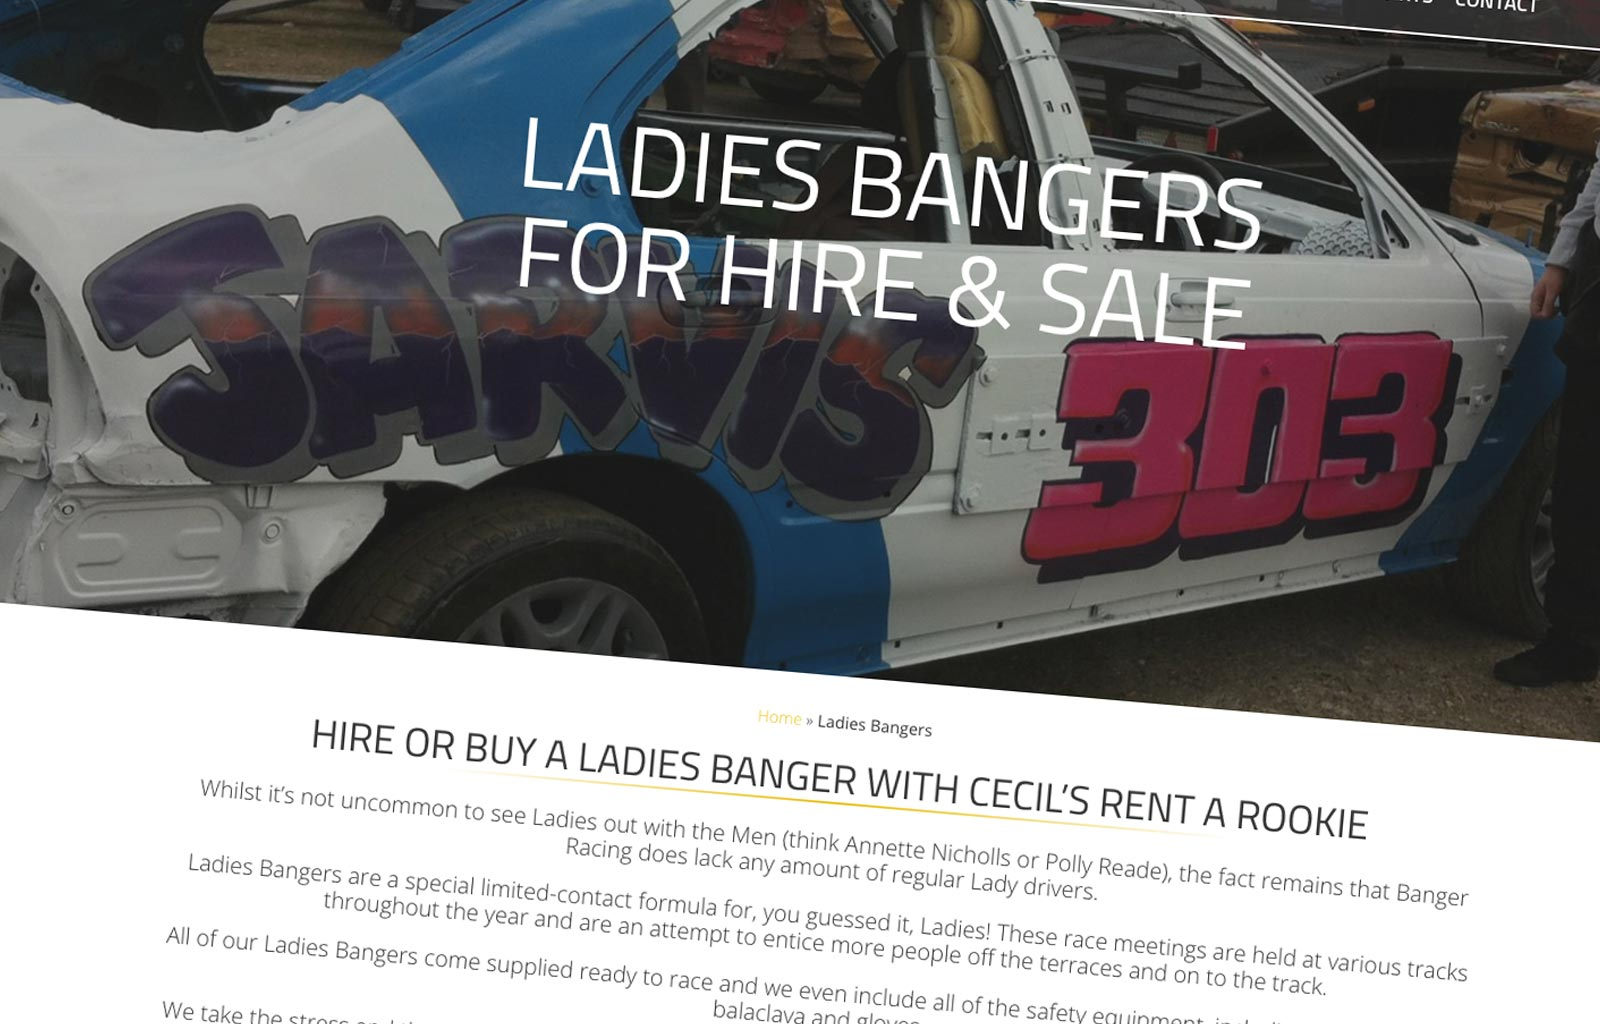 Cecil's Rent A Rookie Ladies Bangers